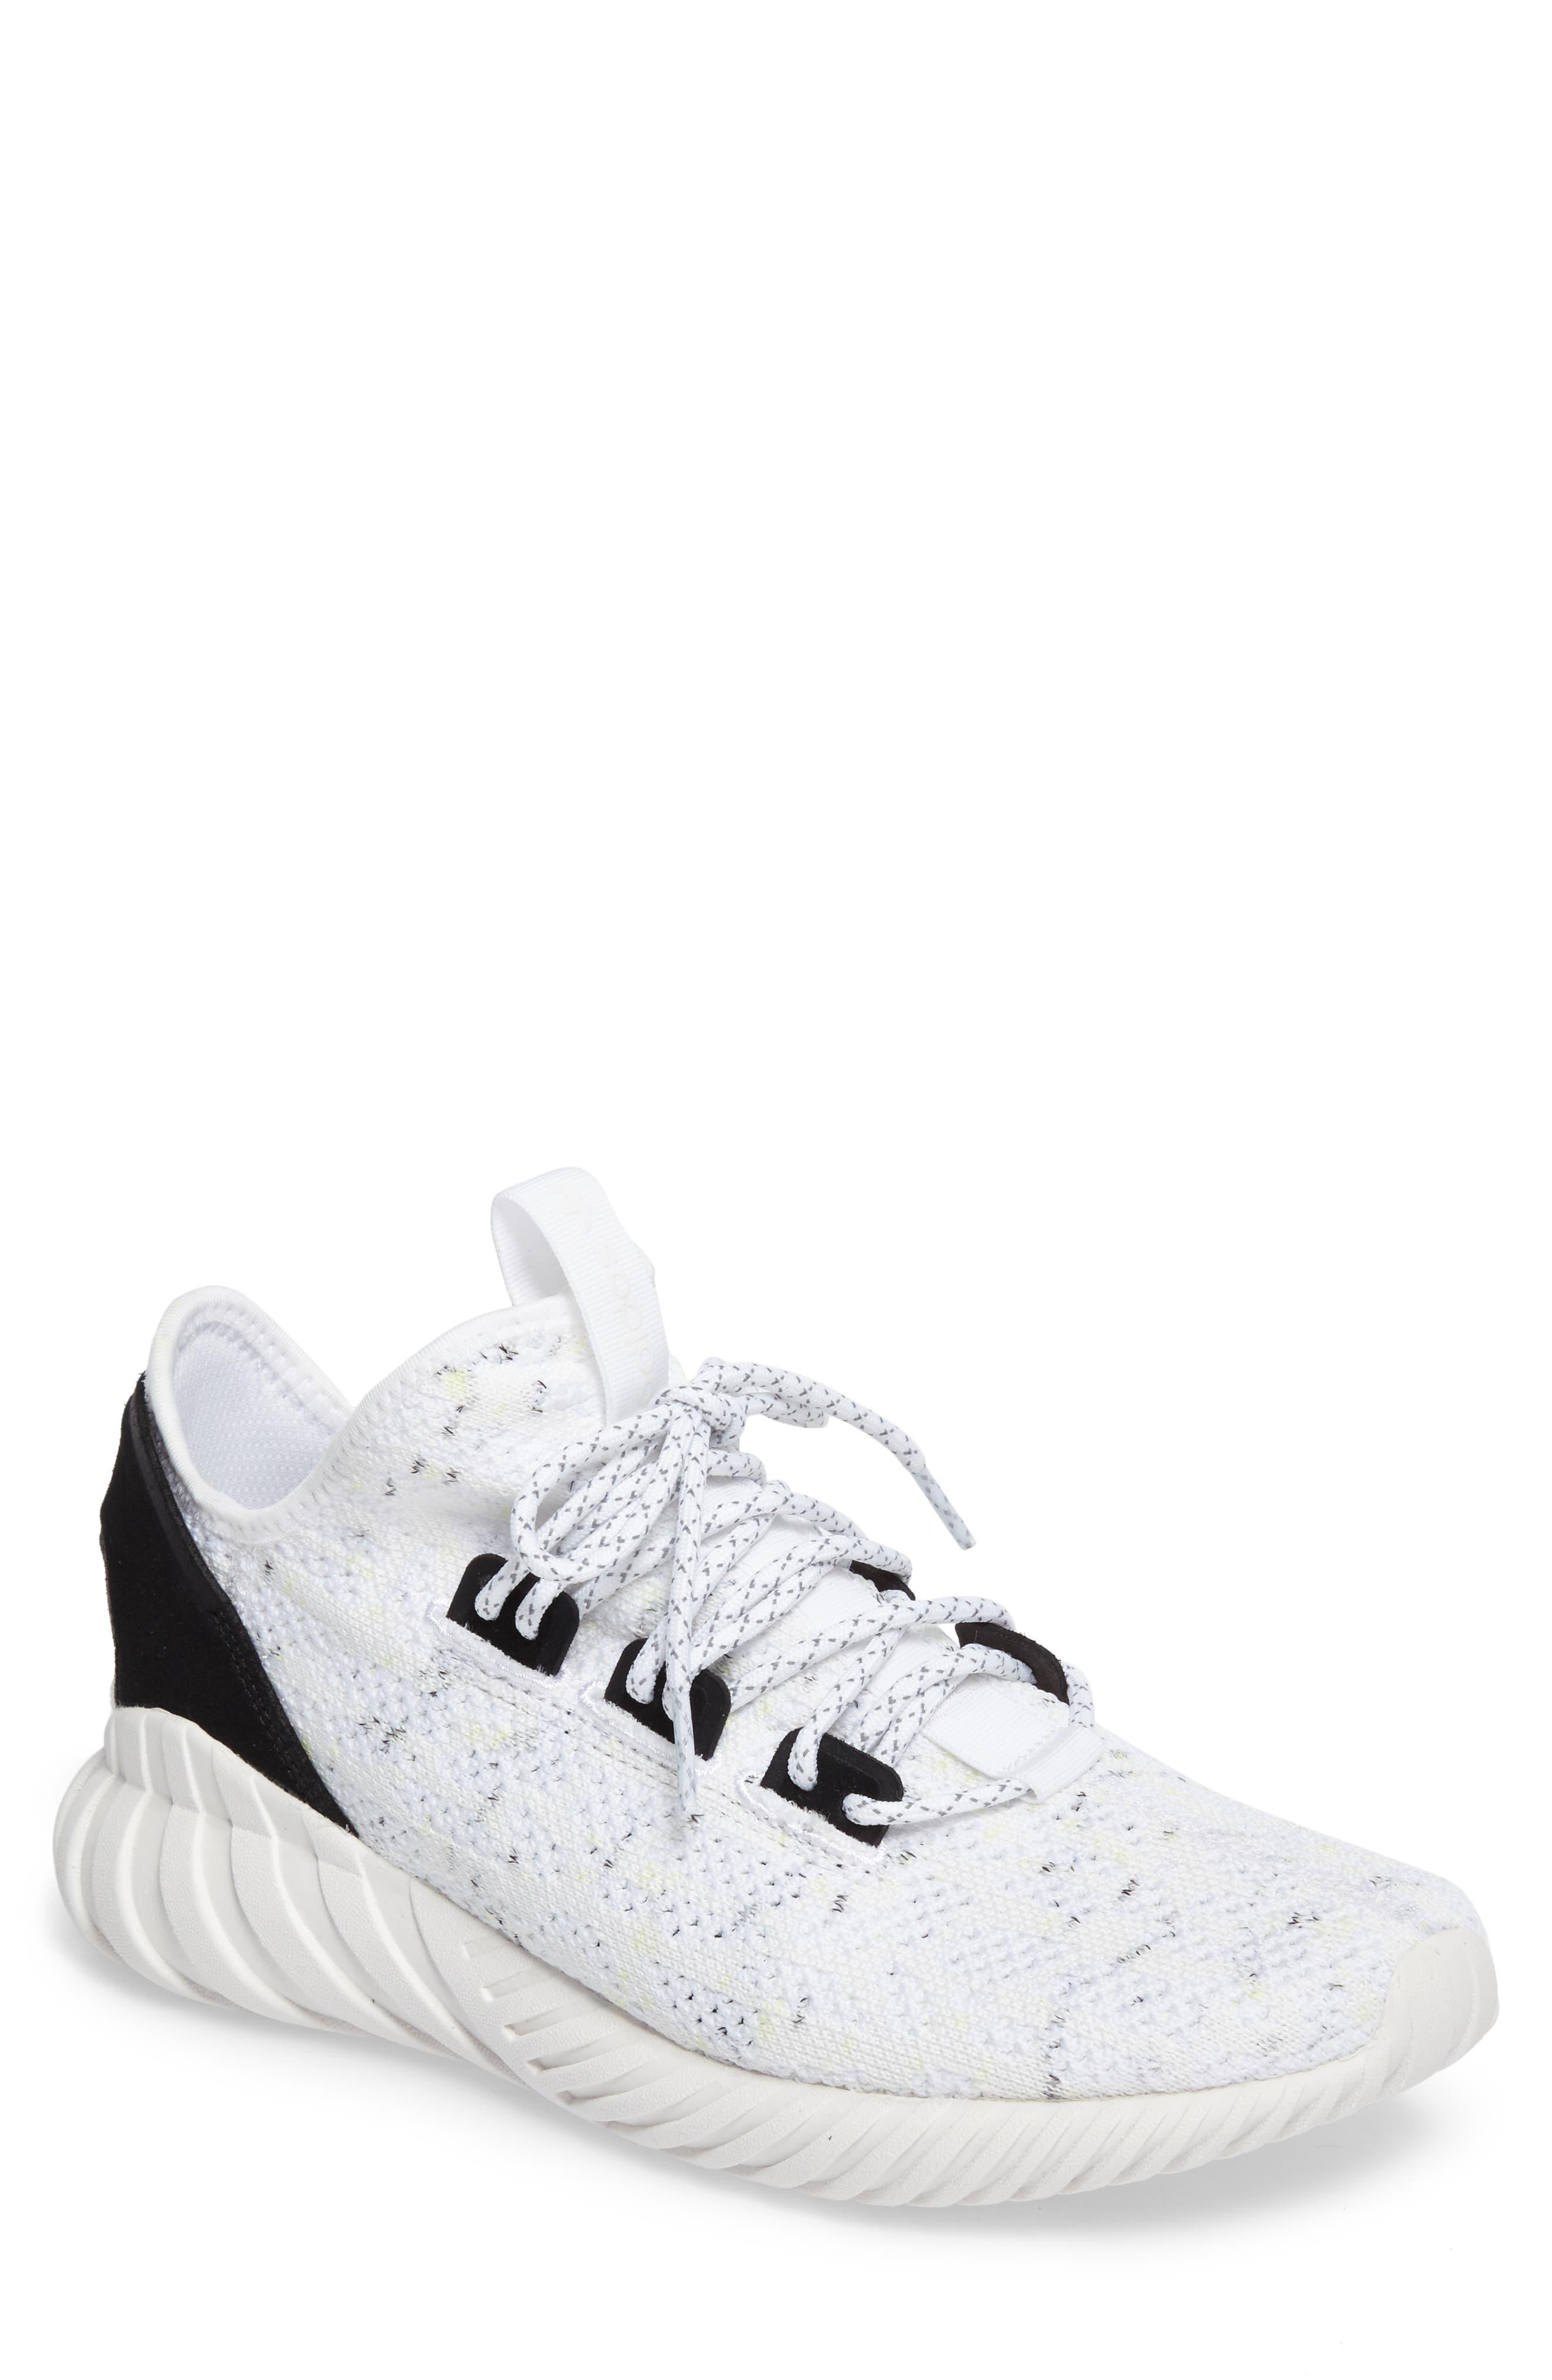 Alternate Image 1 Selected - adidas Tubular Doom PrimeKnit Sneaker (Men)